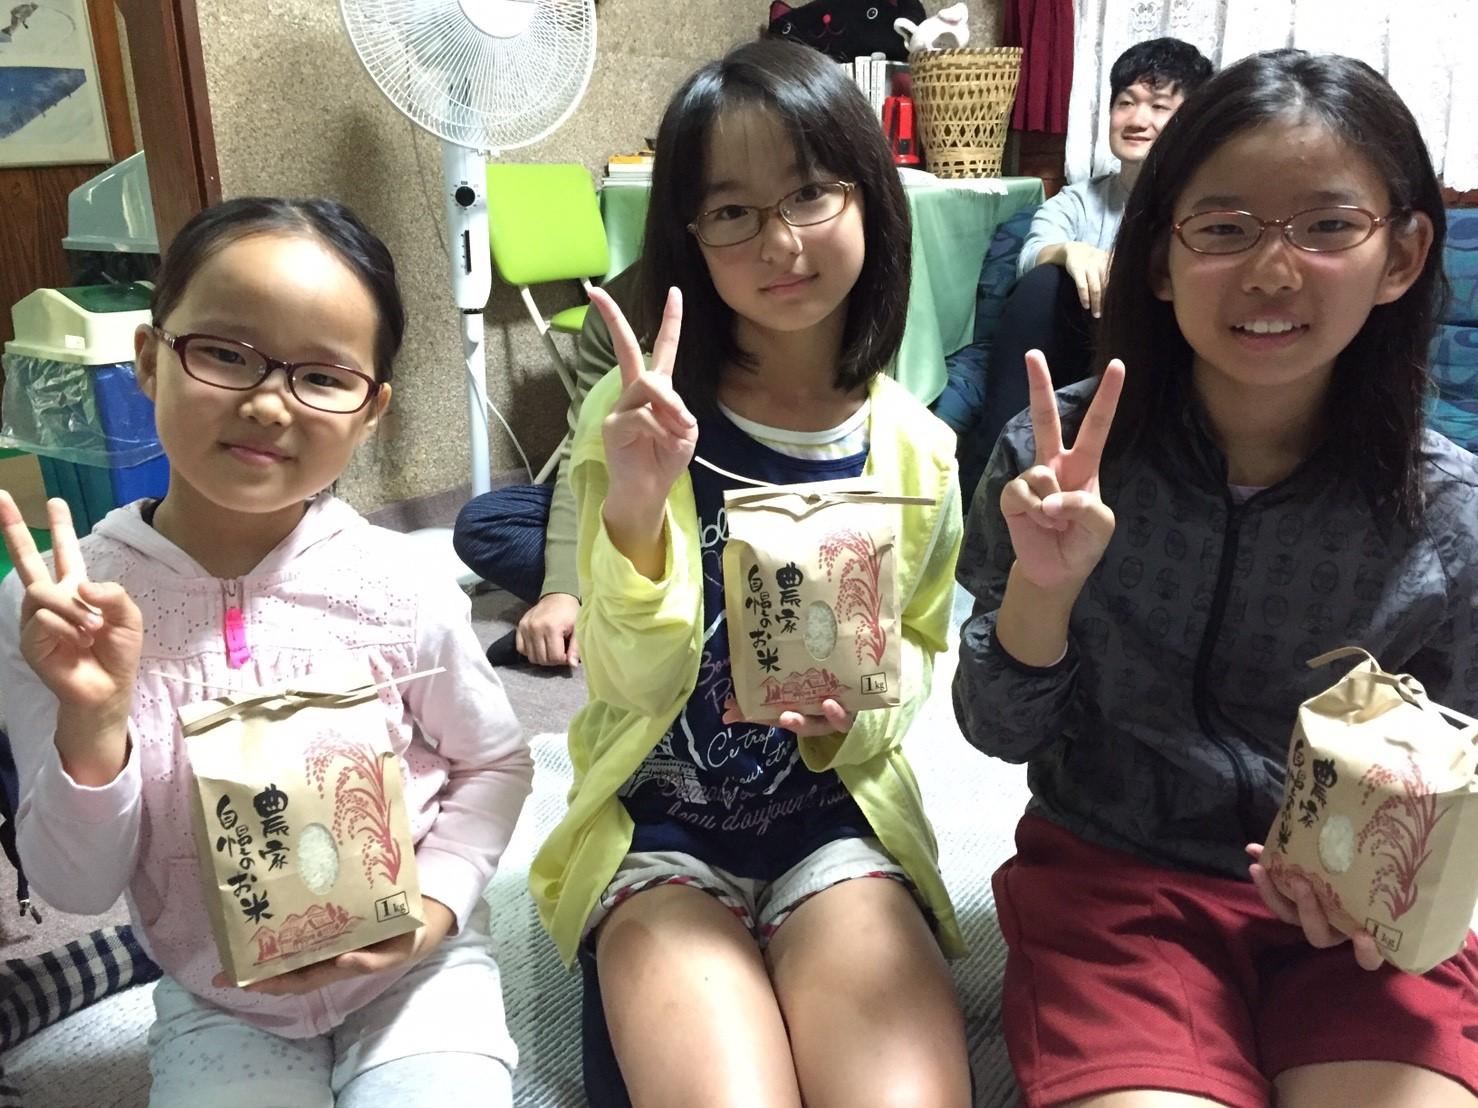 小 学 生 と S E X が し た い 5 4 [無断転載禁止]©2ch.netYouTube動画>36本 ->画像>972枚